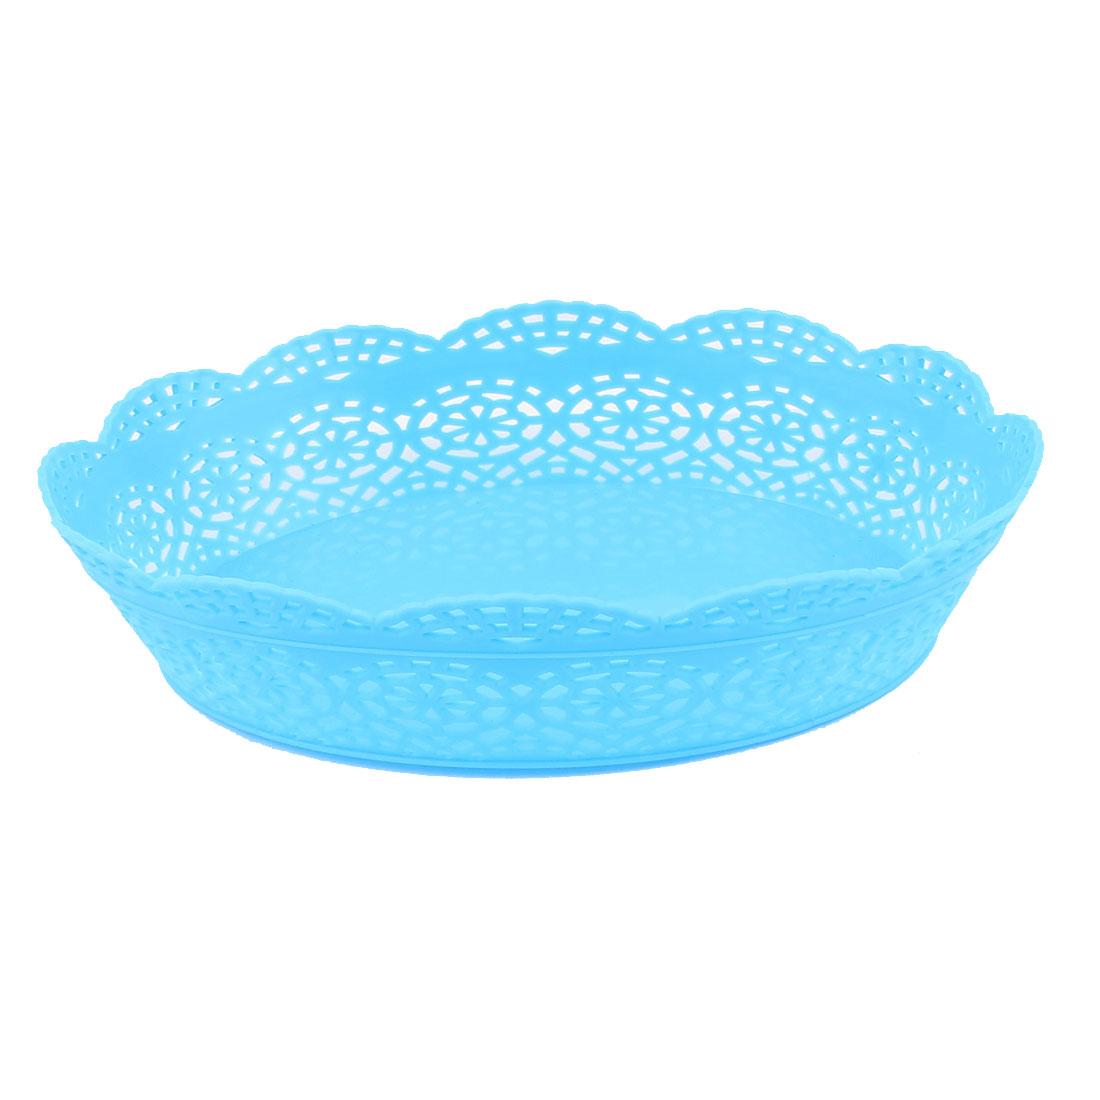 Blue Plastic Oval Shaped Flower Edge Decor Fruit Vegetable Storage Holder Basket Organizer